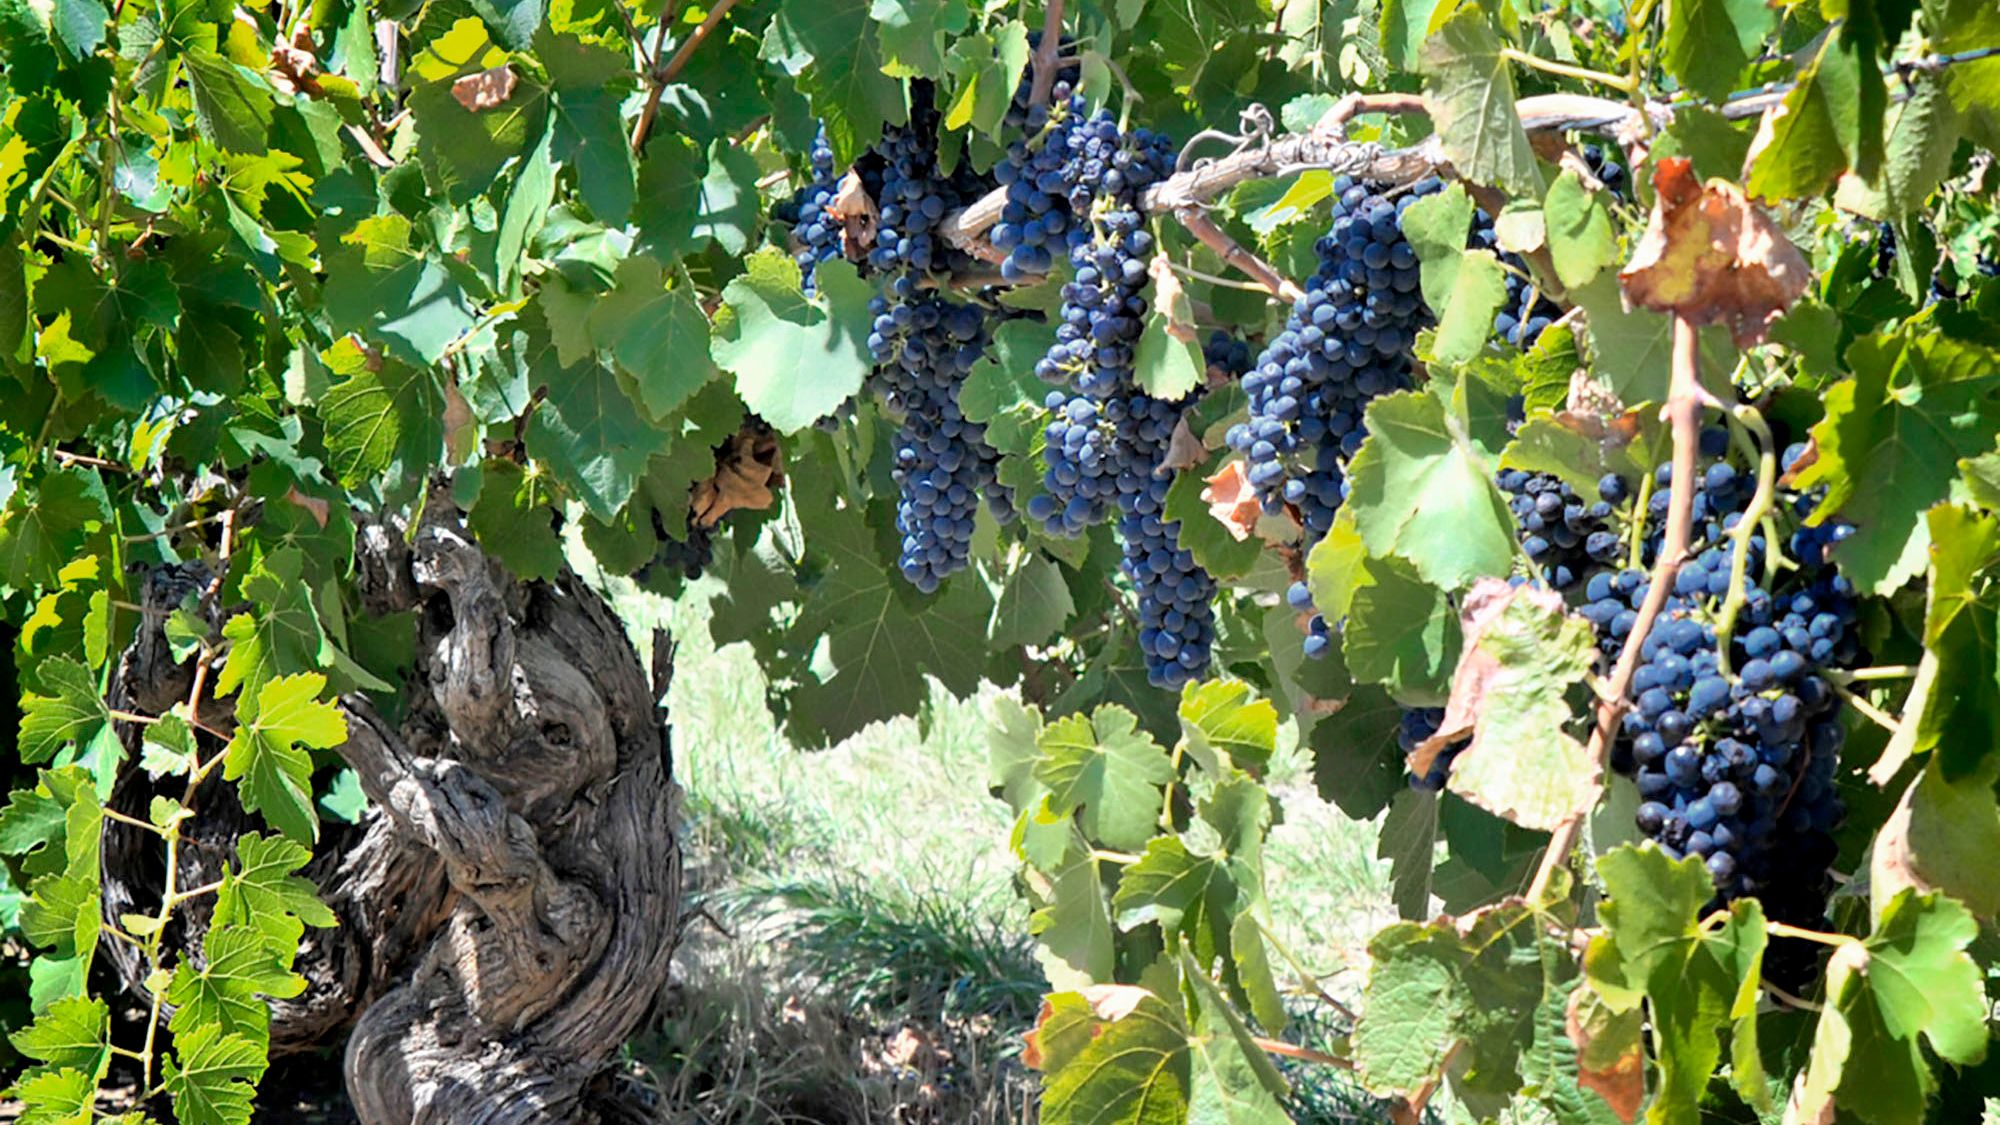 Grapes on vine in Northern Barossa Valley in Australia.